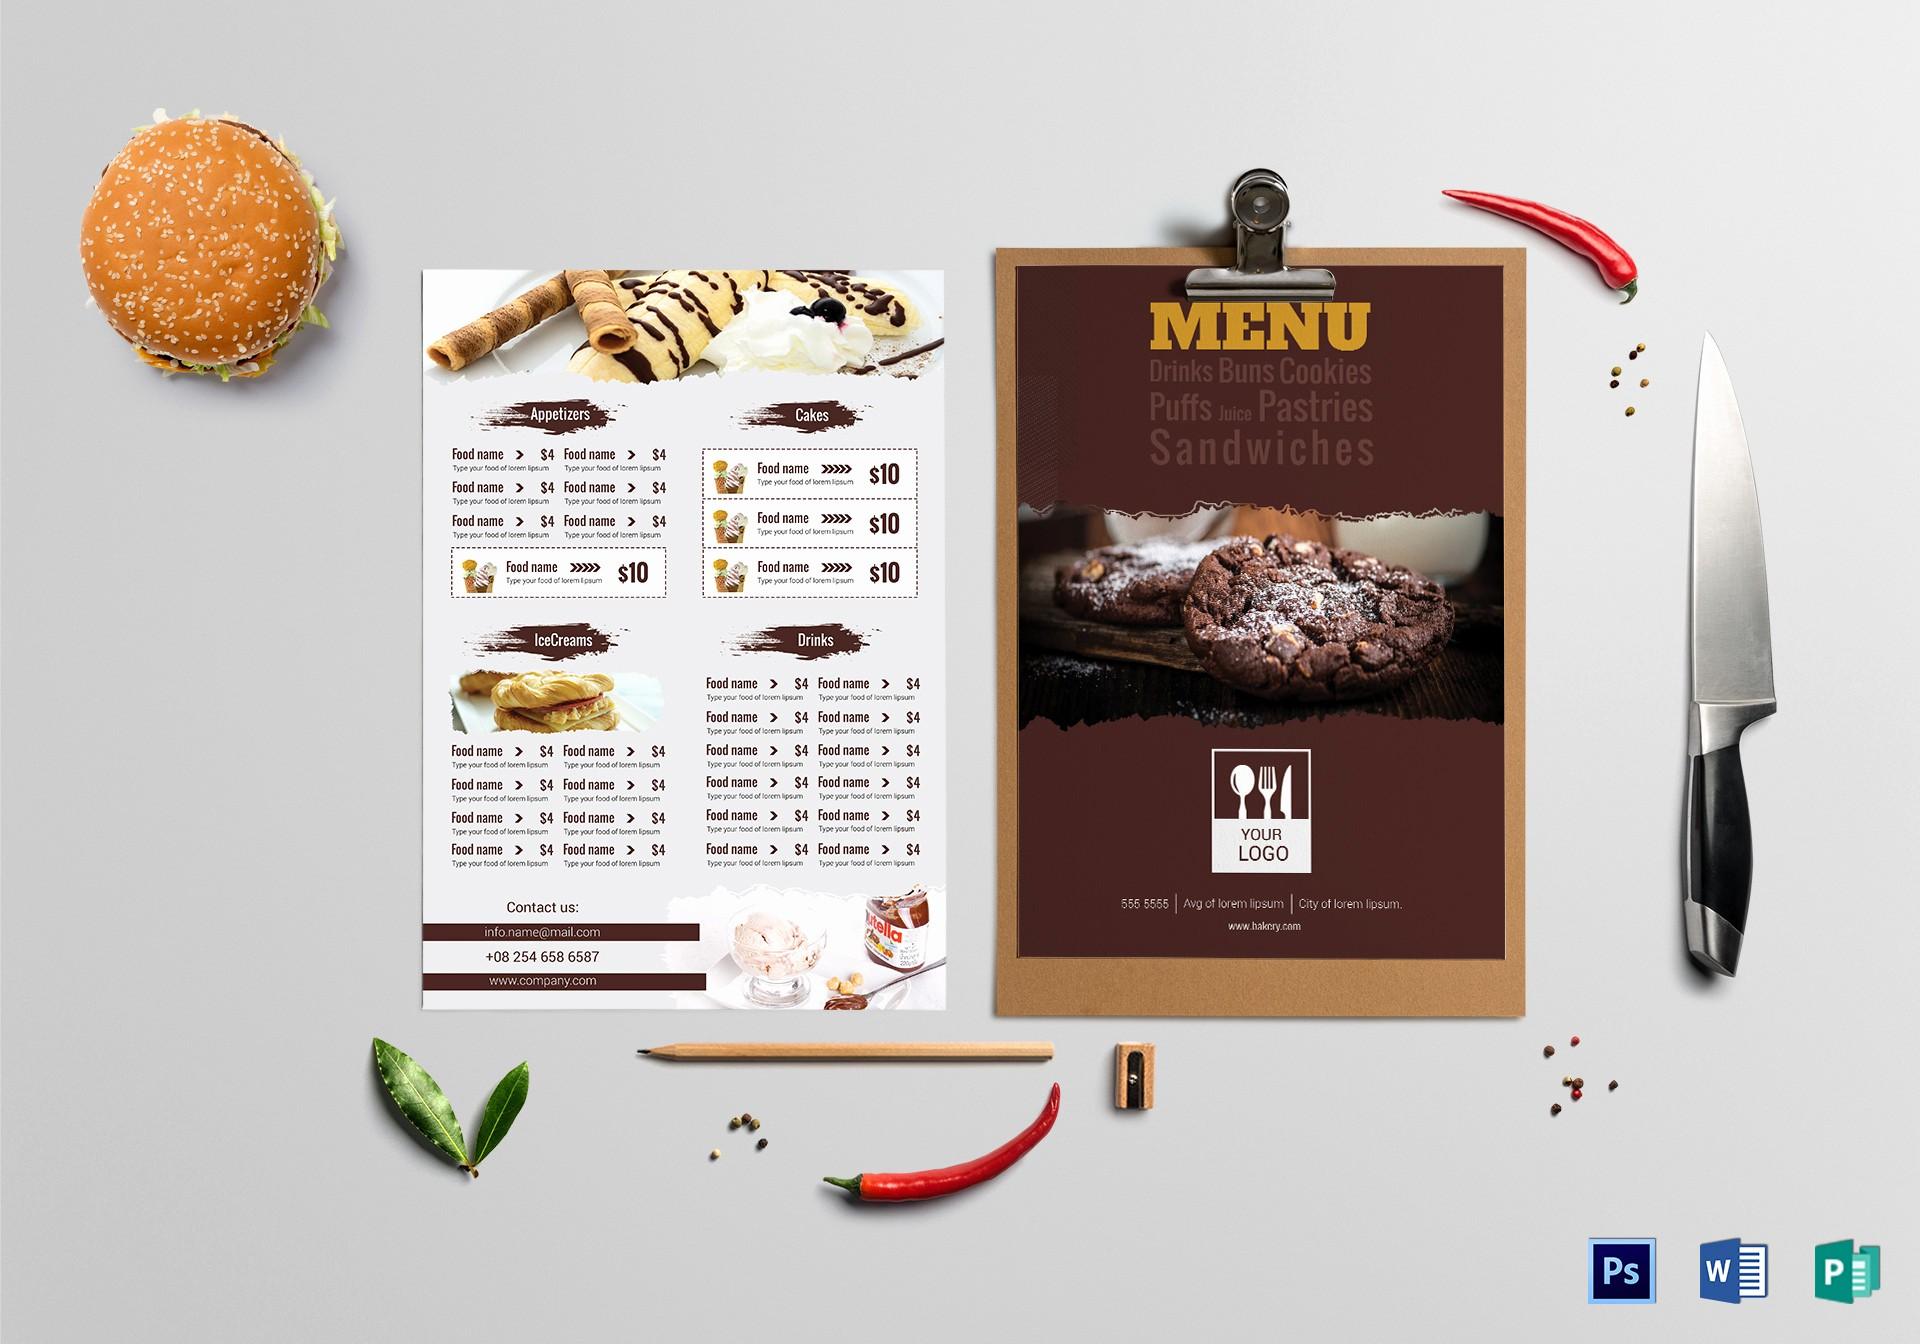 Bakery Menu Template Word Free Inspirational Tasty Bakery Menu Design Template In Psd Word Publisher